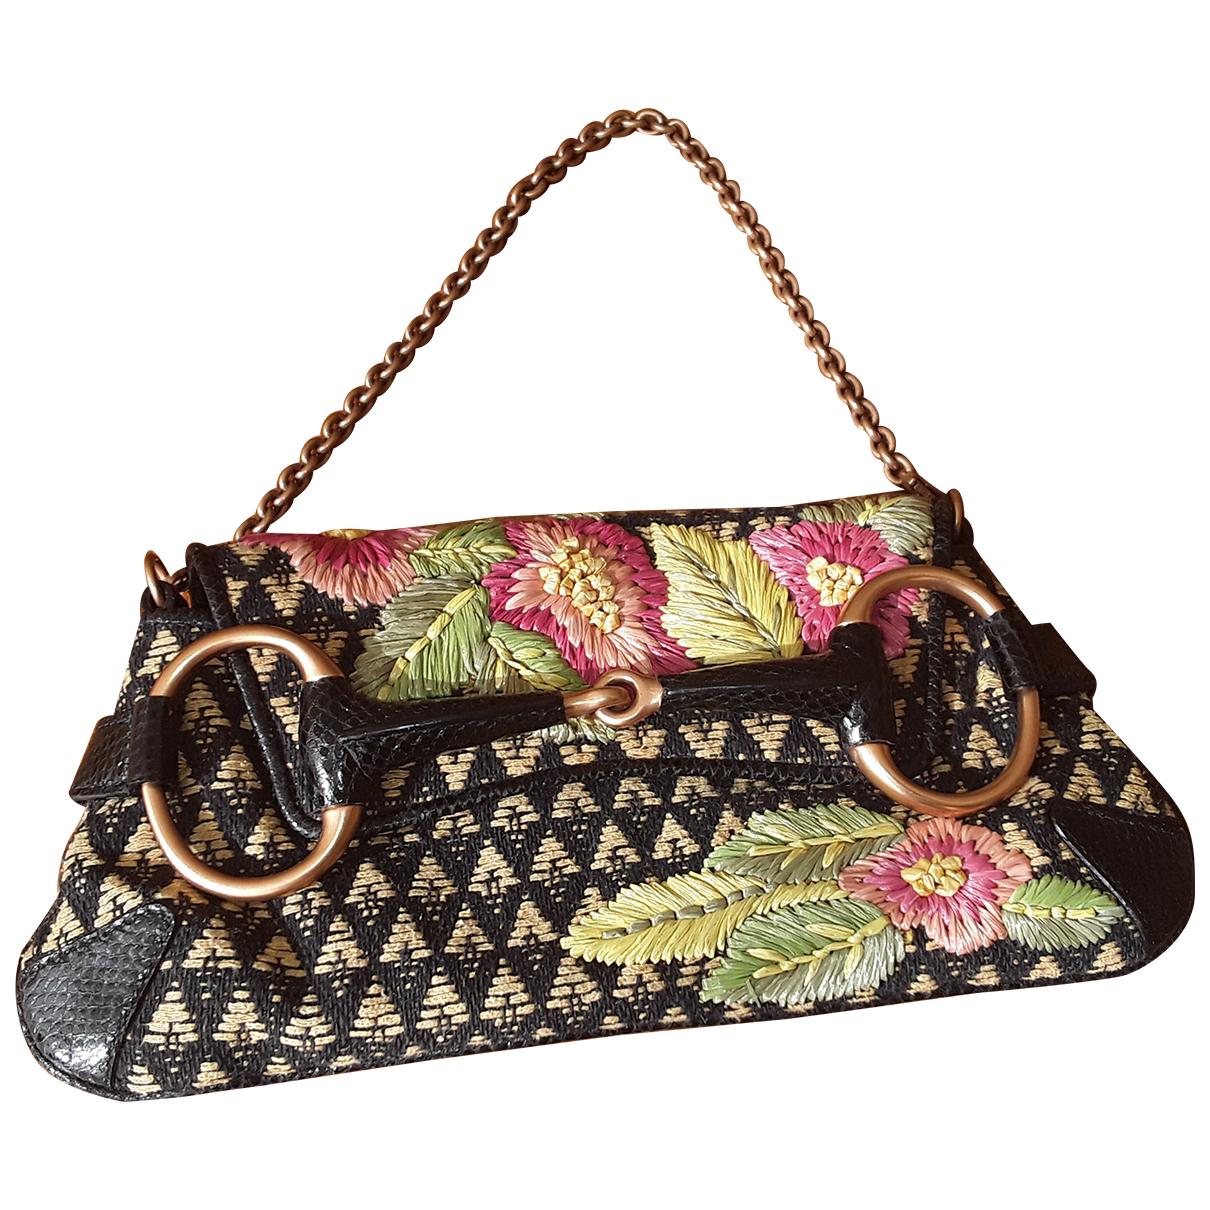 Gucci N Multicolour Wool Clutch bag for Women N